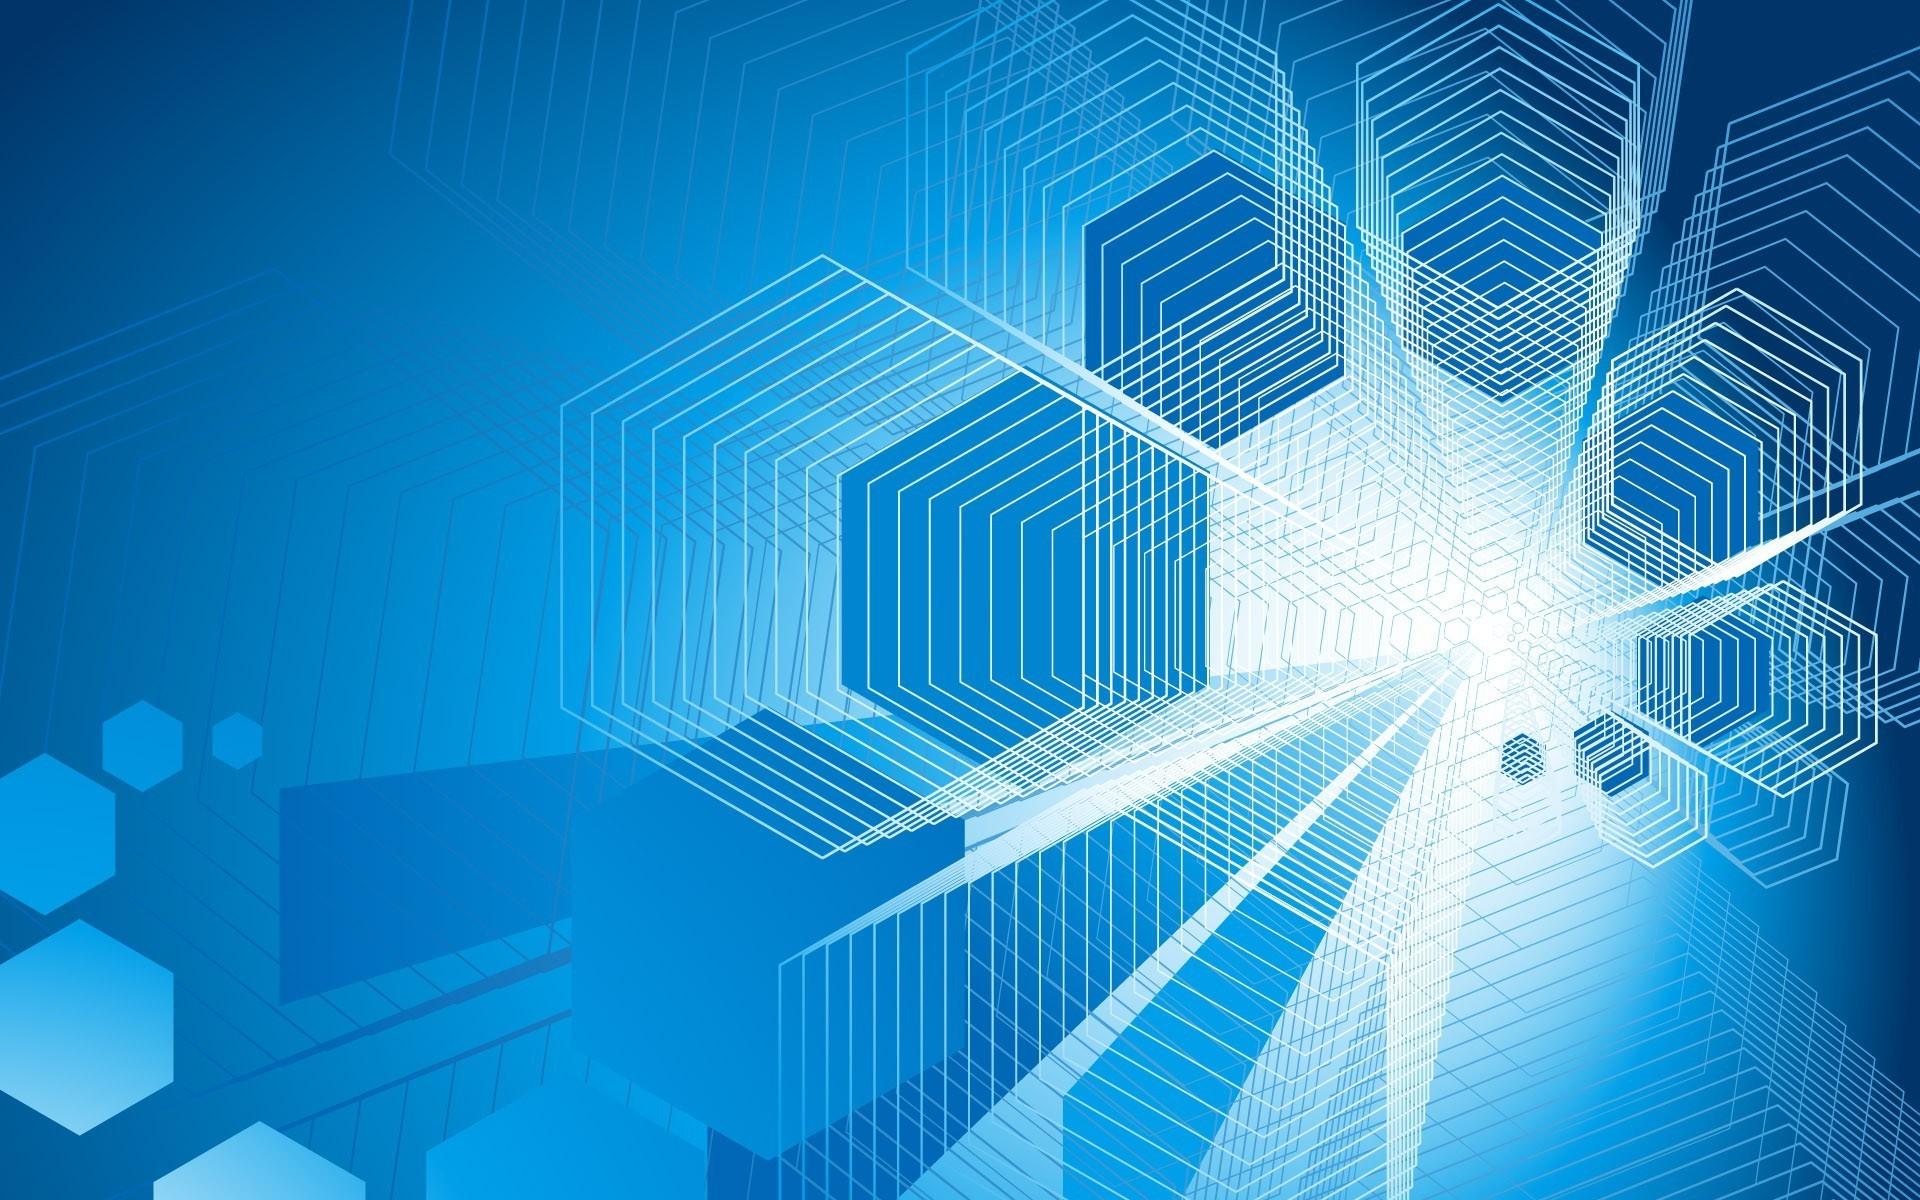 Art Wallpaper Hd For Mobile 23: Blue Hexagon Wallpaper (83+ Images